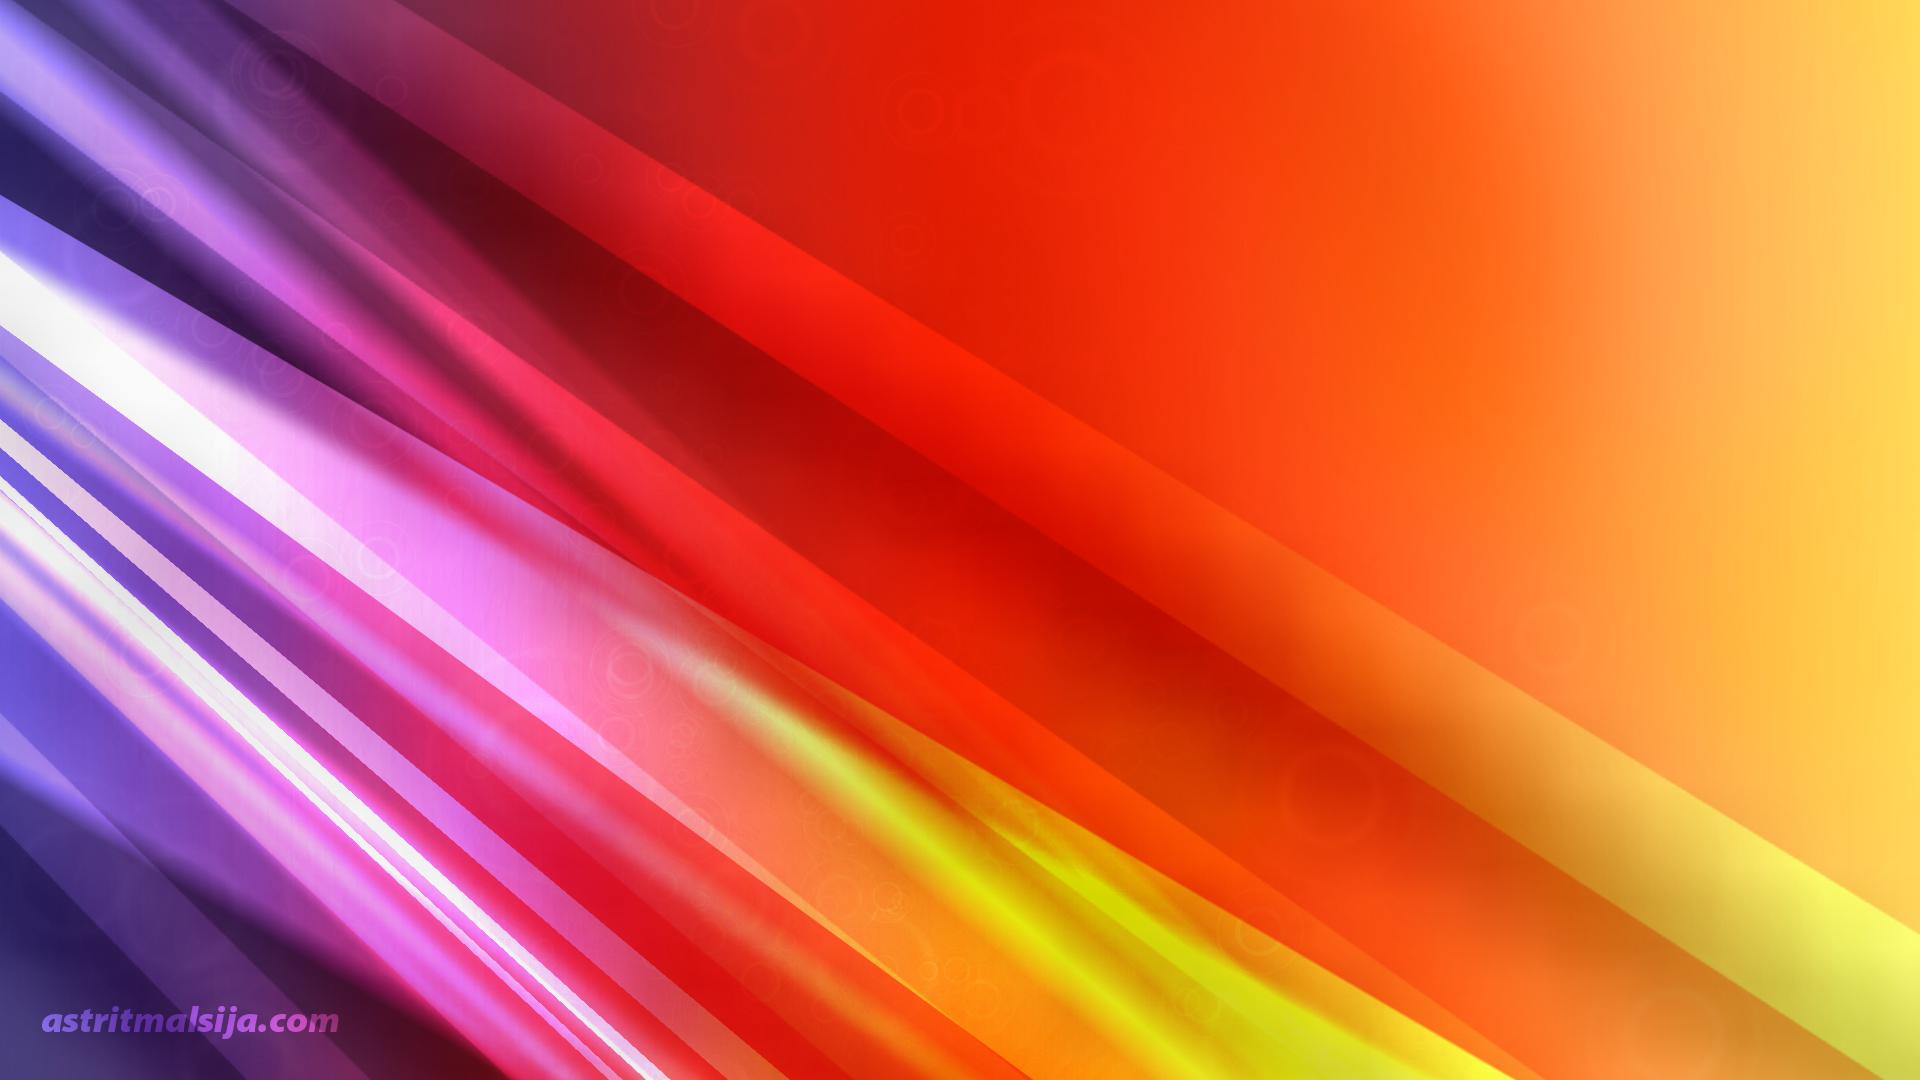 Abstract Wallpaper by blottah Abstract Wallpaper by blottah